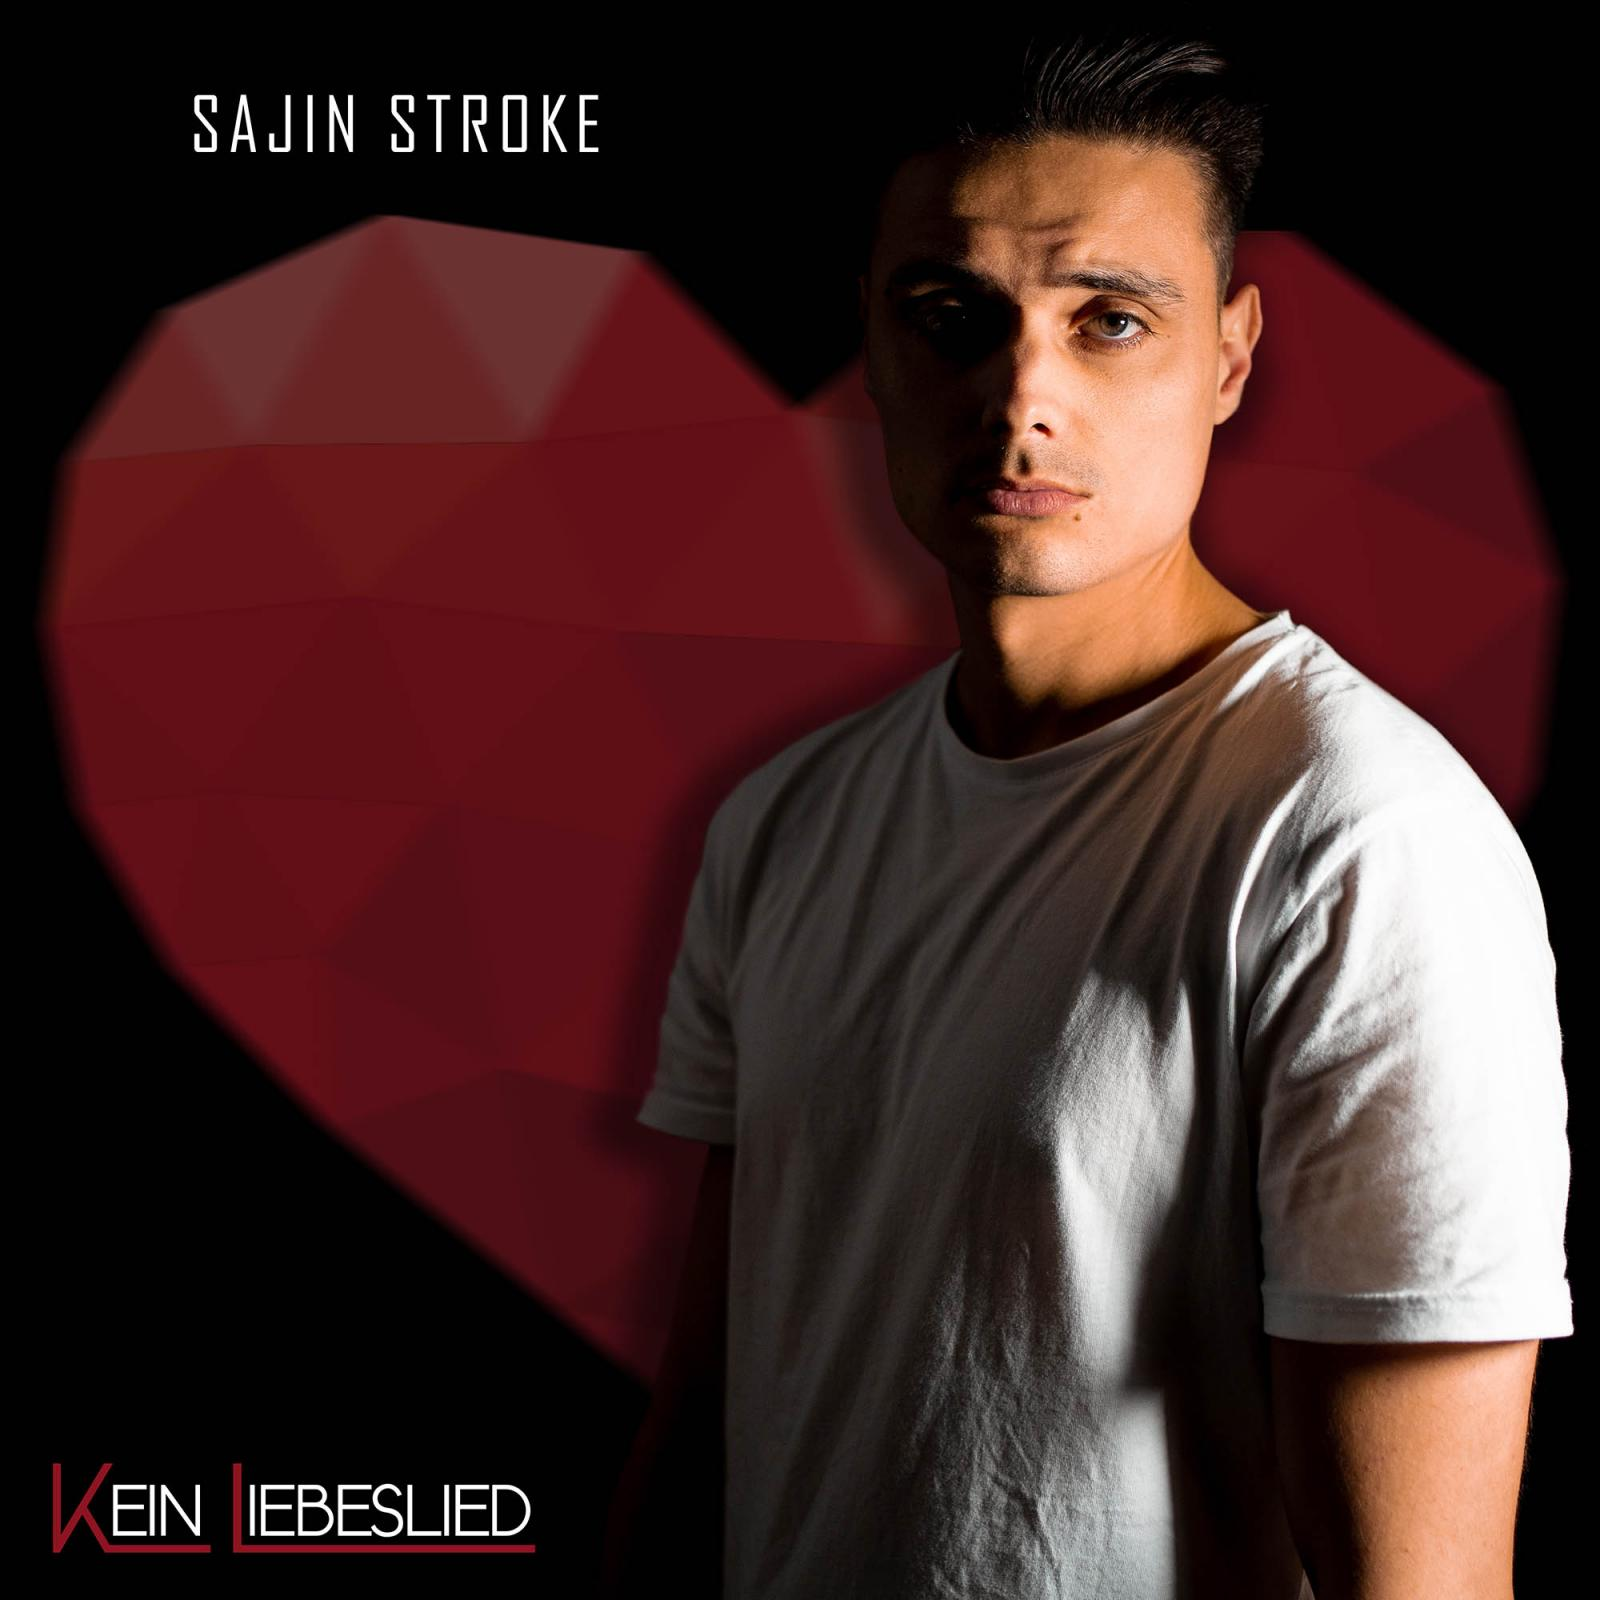 Upcoming: Sajin Stroke - Kein Liebeslied